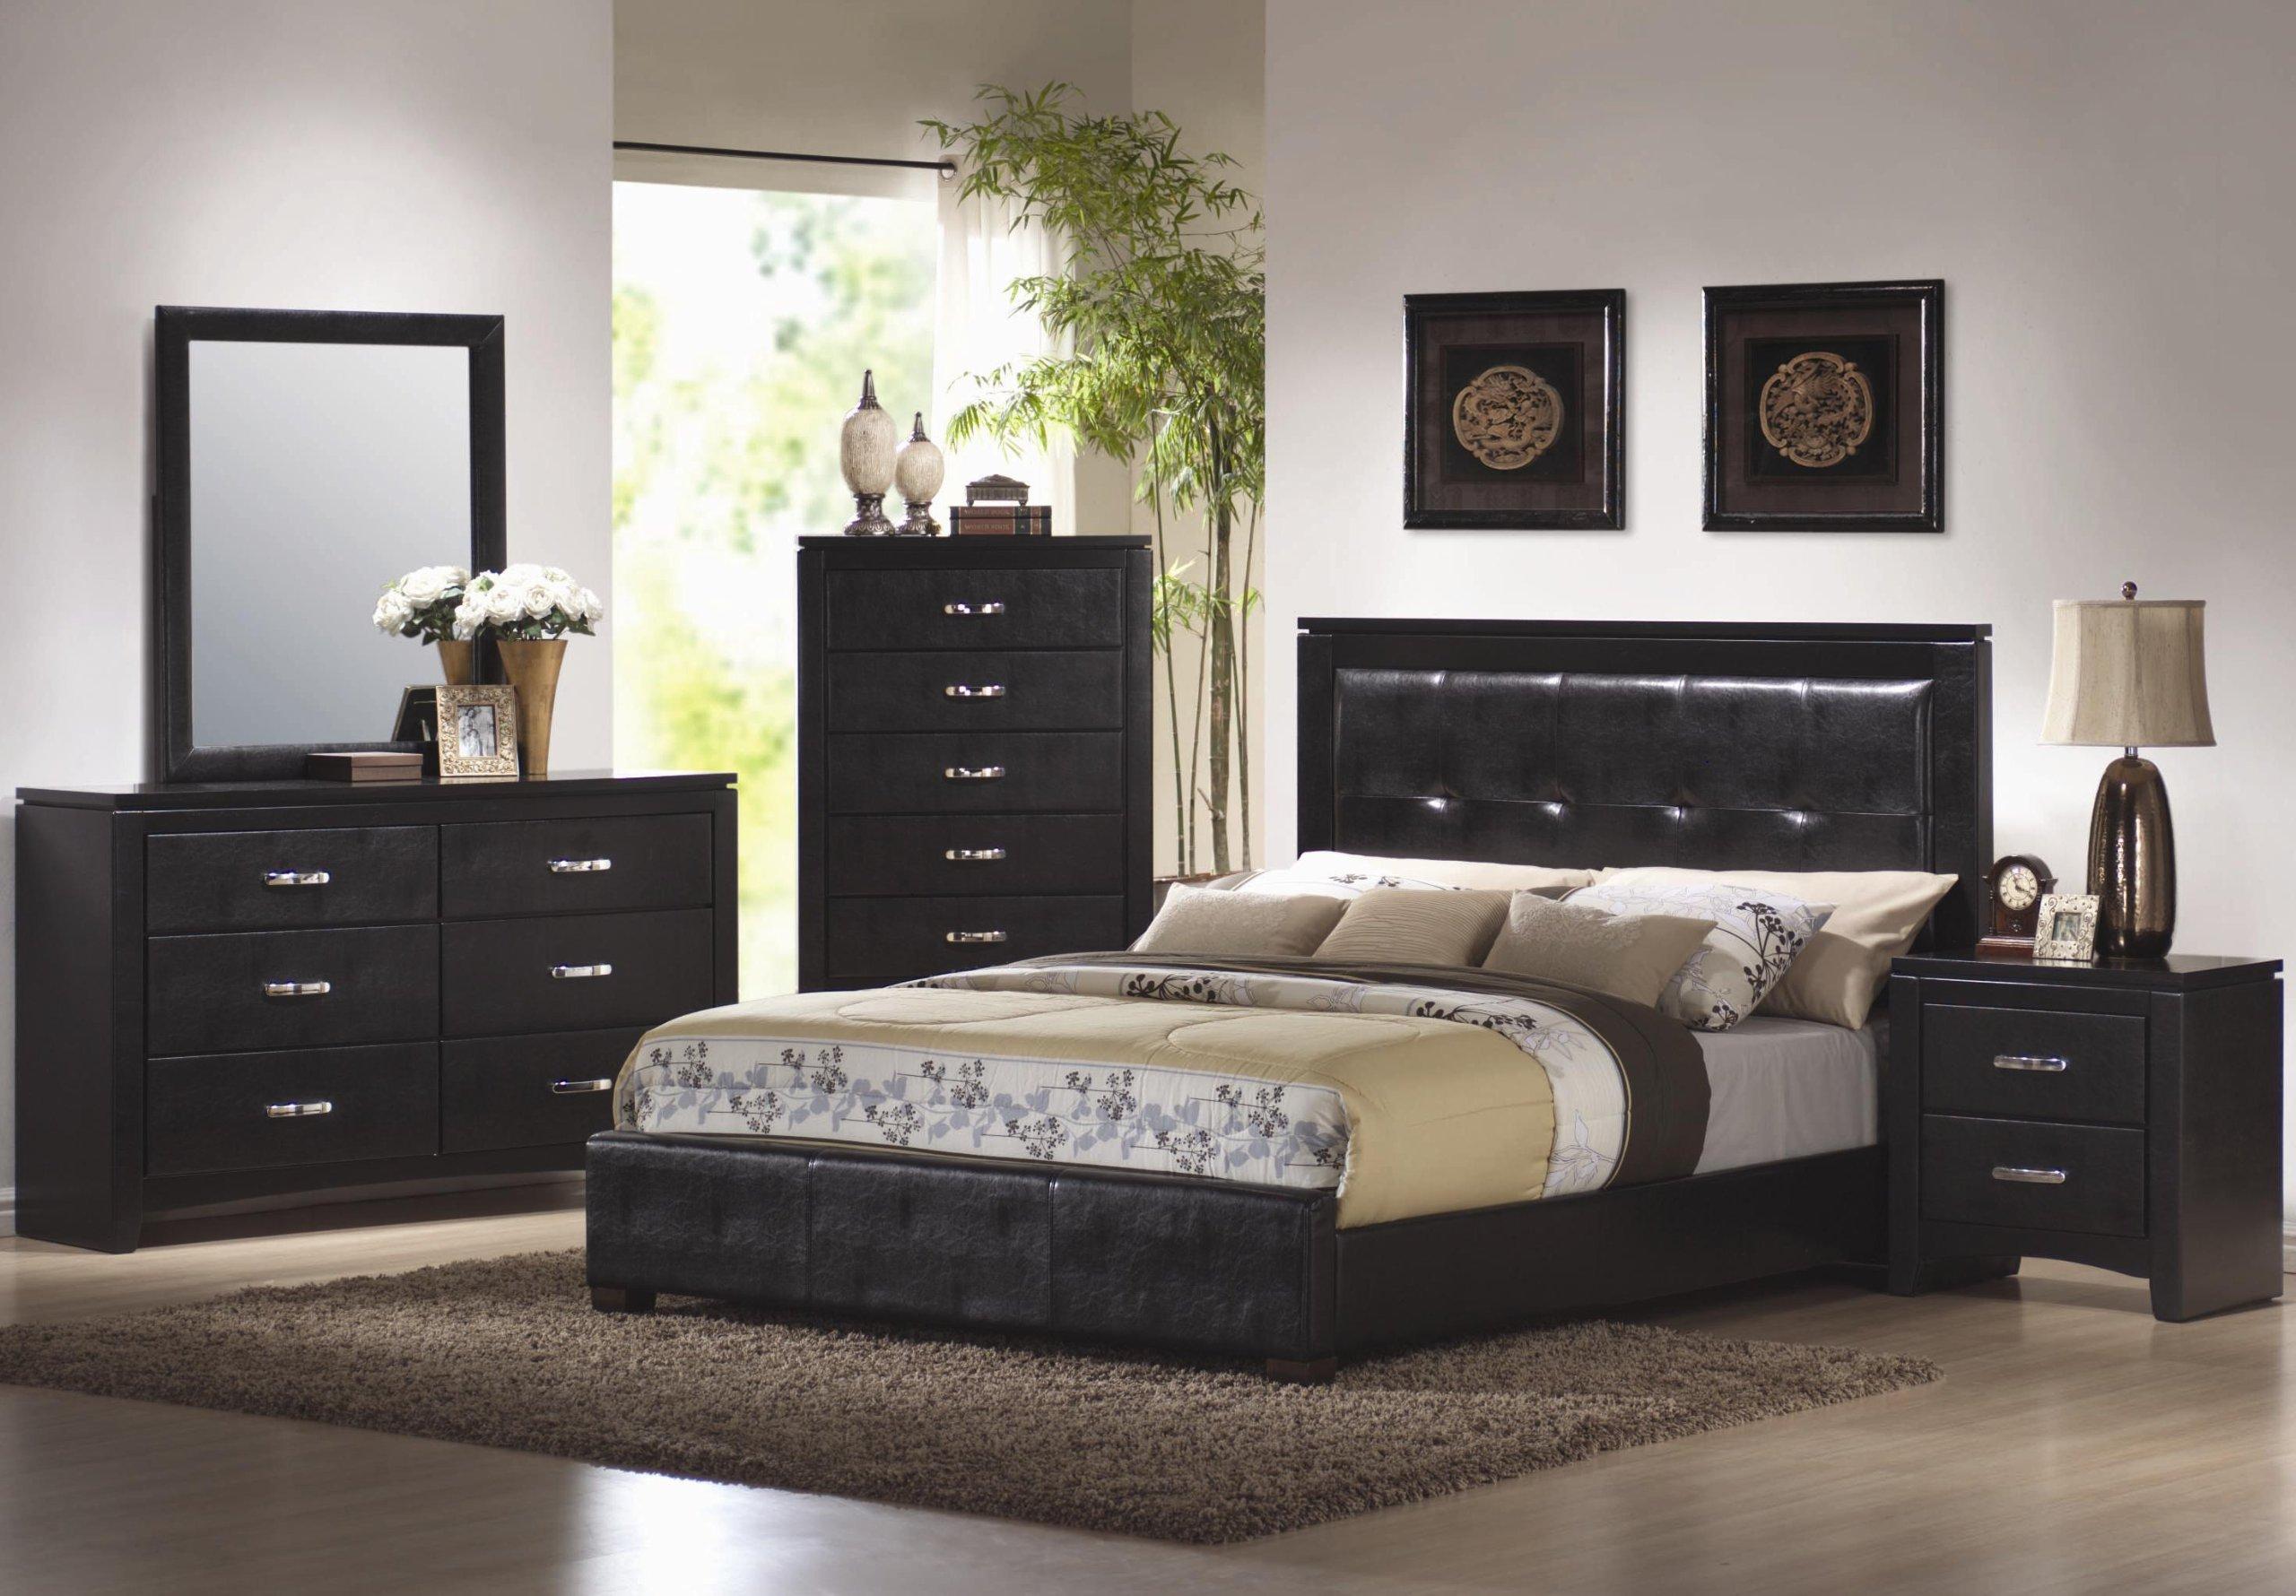 4pc California King Size Bedroom Set In Buy Online In Brunei At Desertcart